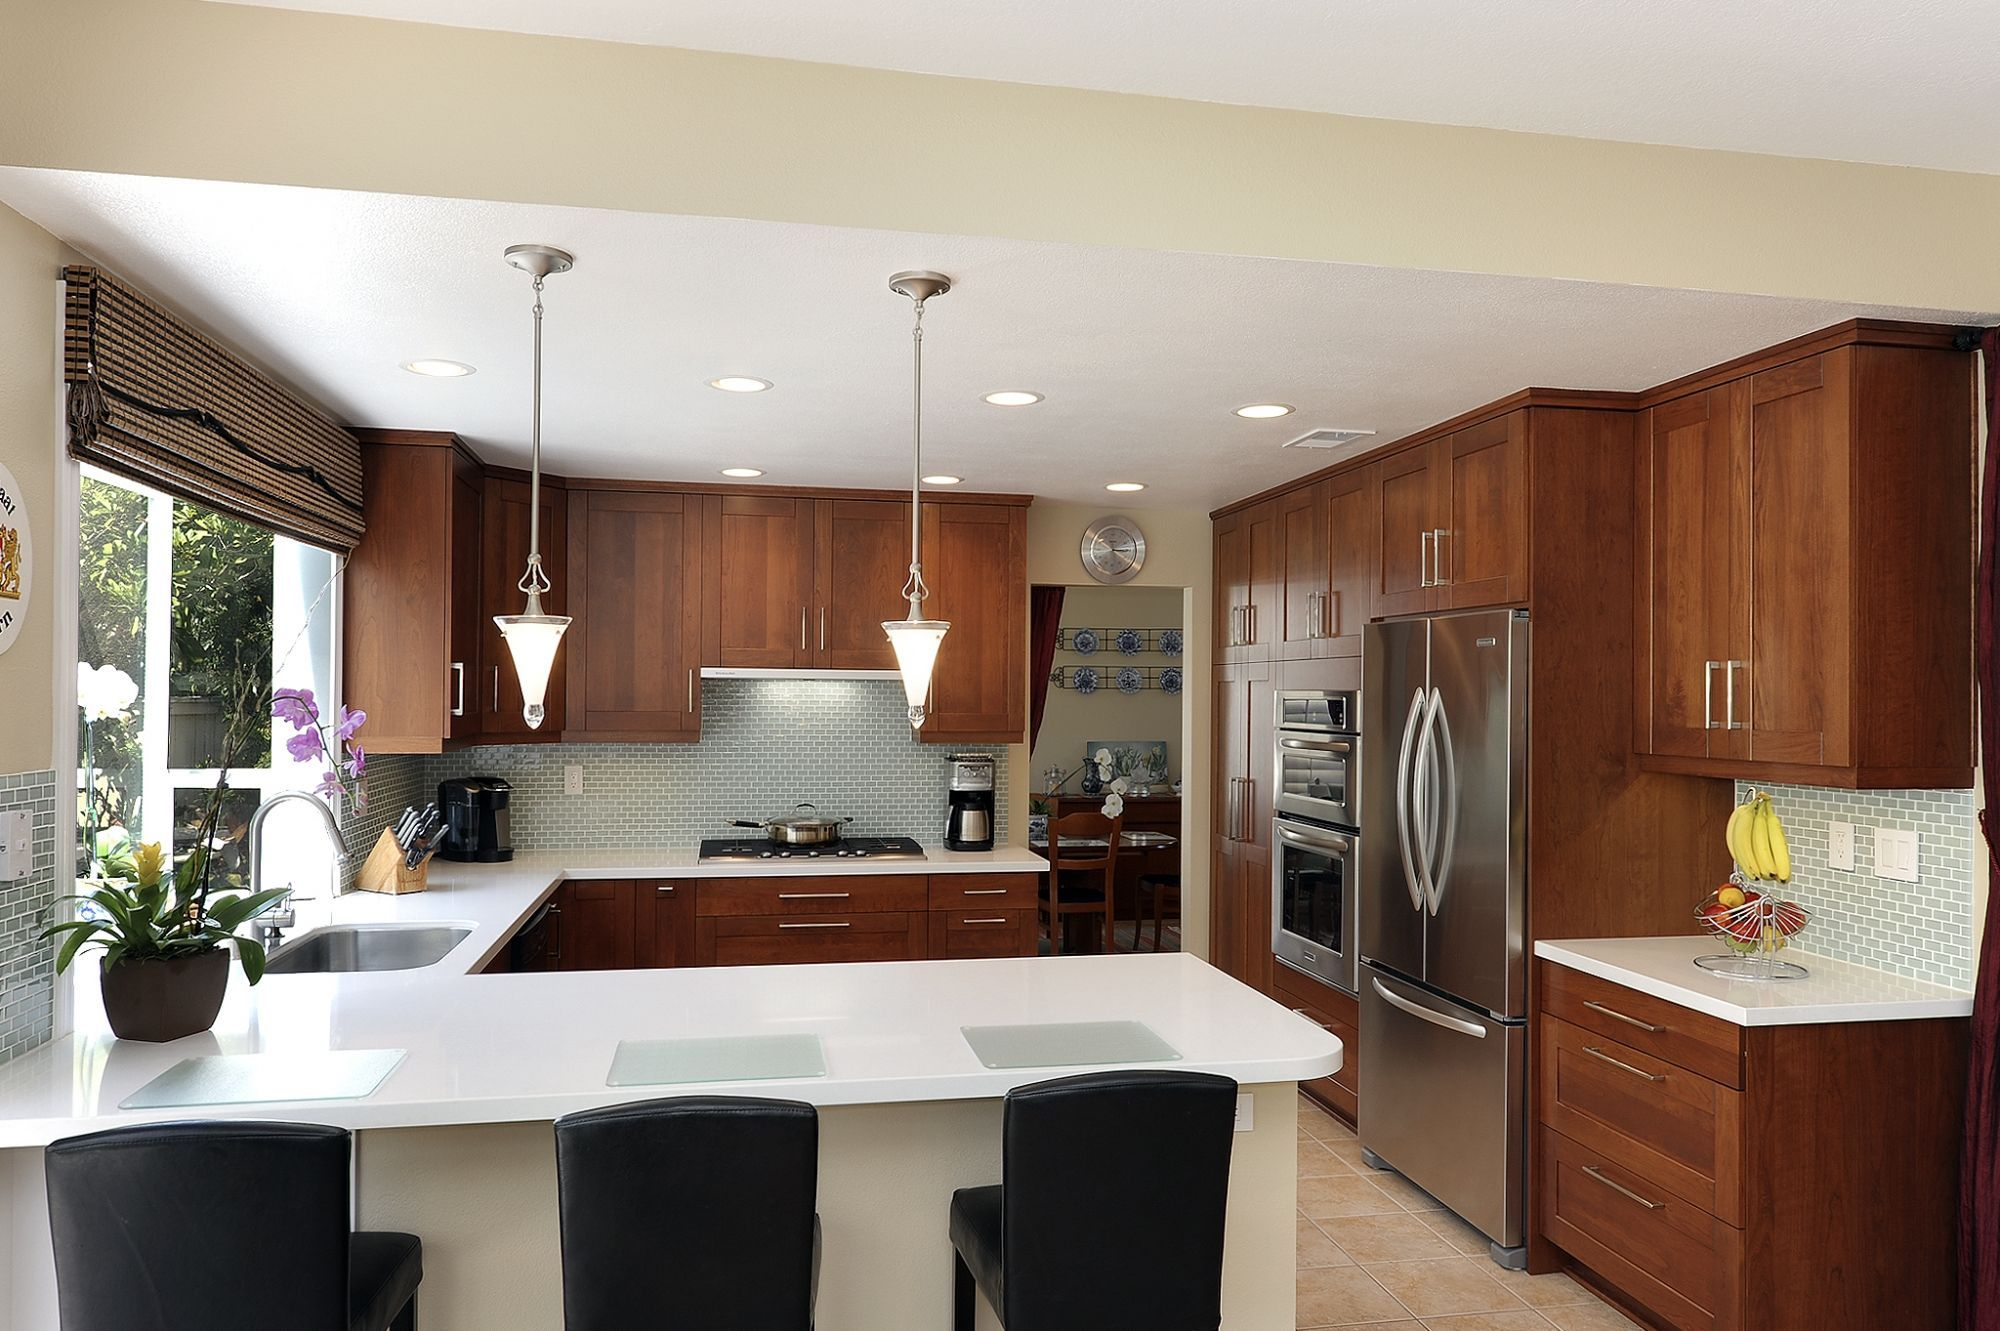 9 fascinating ideas for practical u shaped kitchen small u shaped kitchens u shaped kitchen on kitchen ideas u shaped layout id=41651